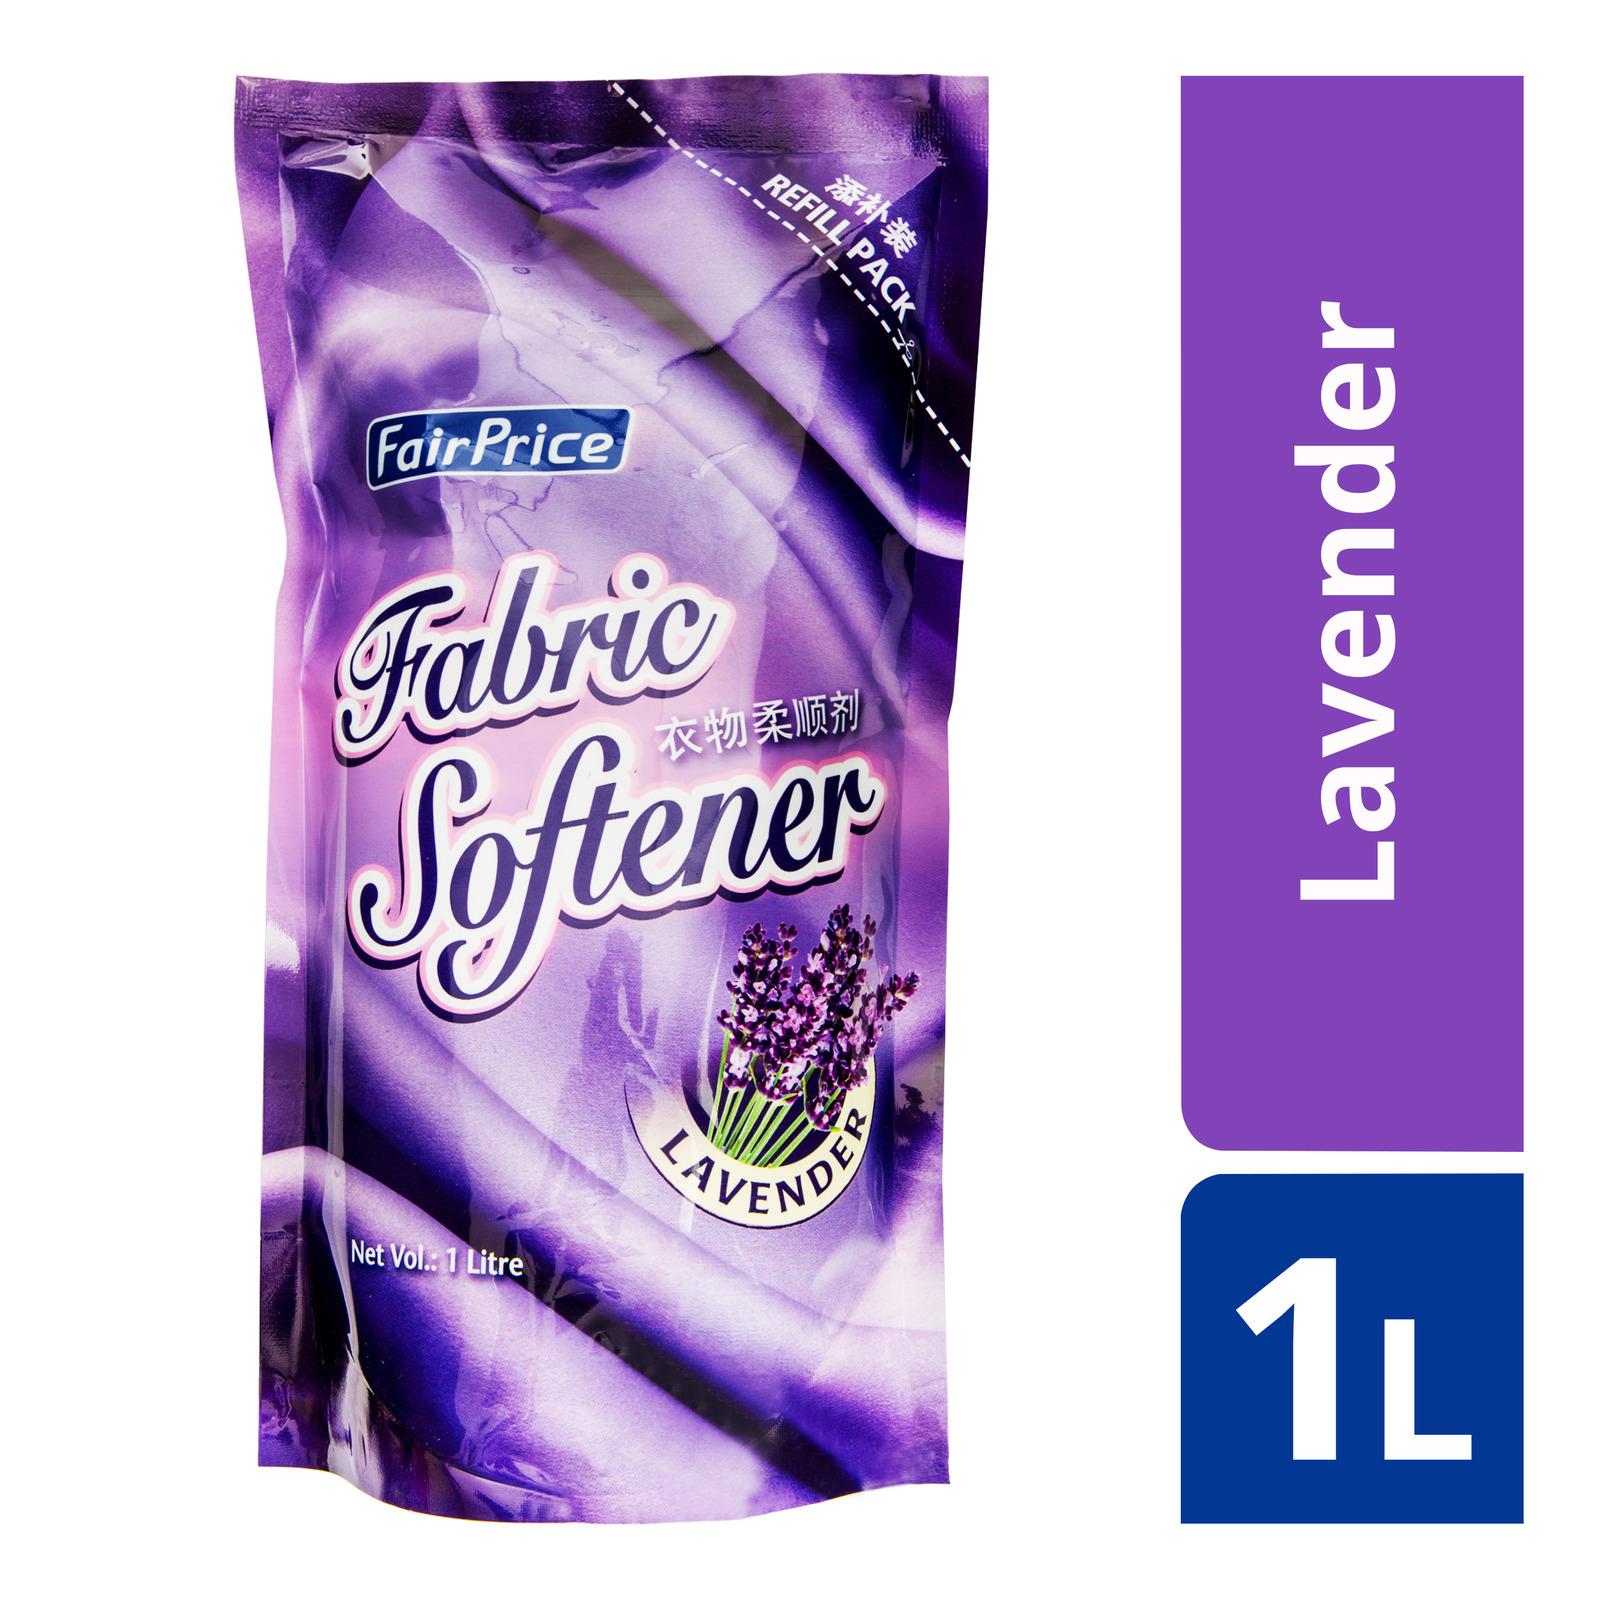 FairPrice Fabric Softener Refill - Lavender